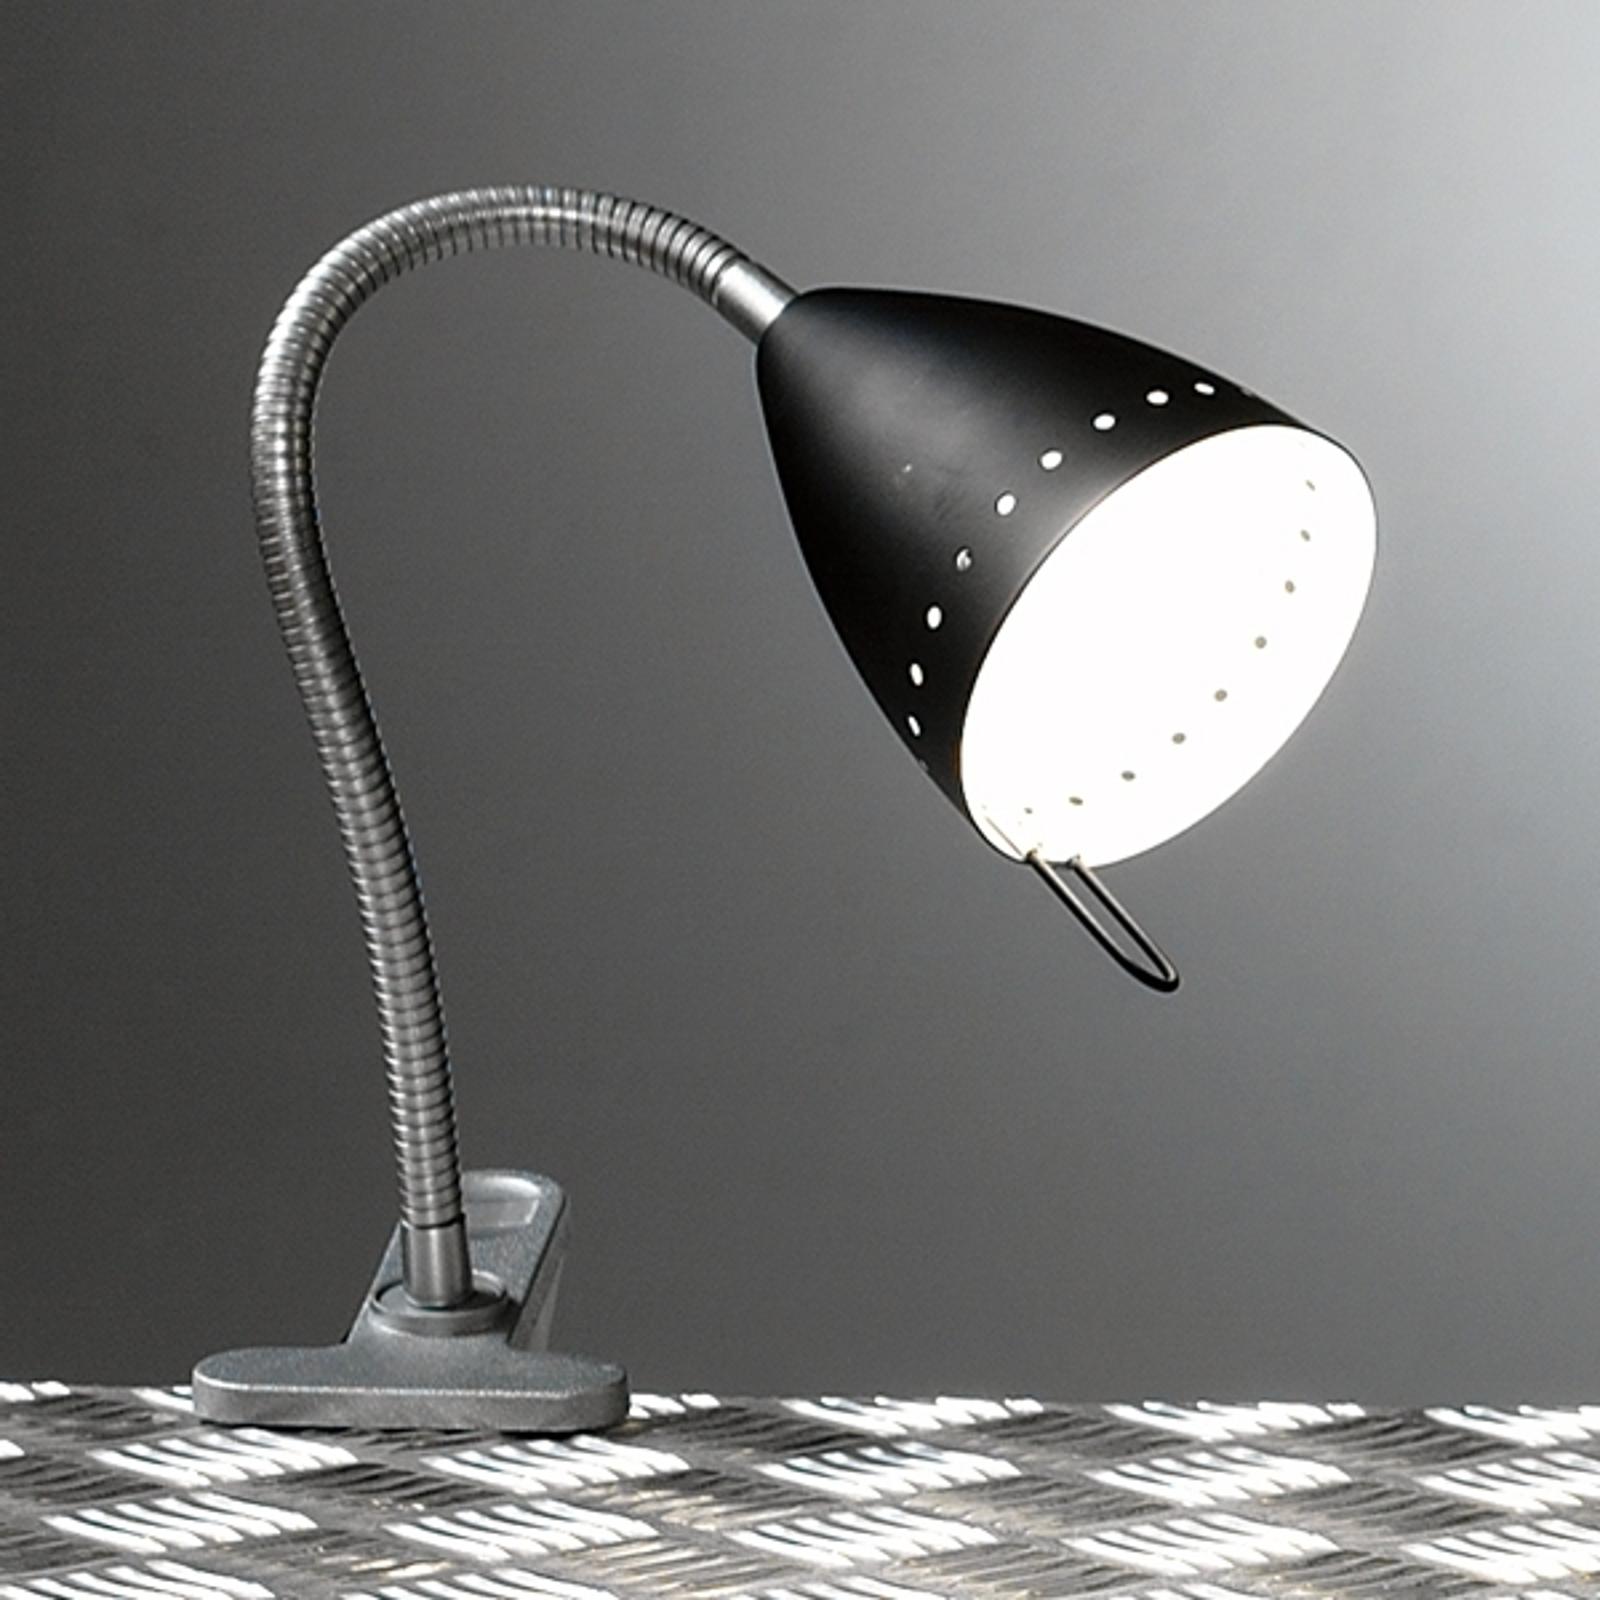 Practical ANGELICA clip-on light, black_7540346_1